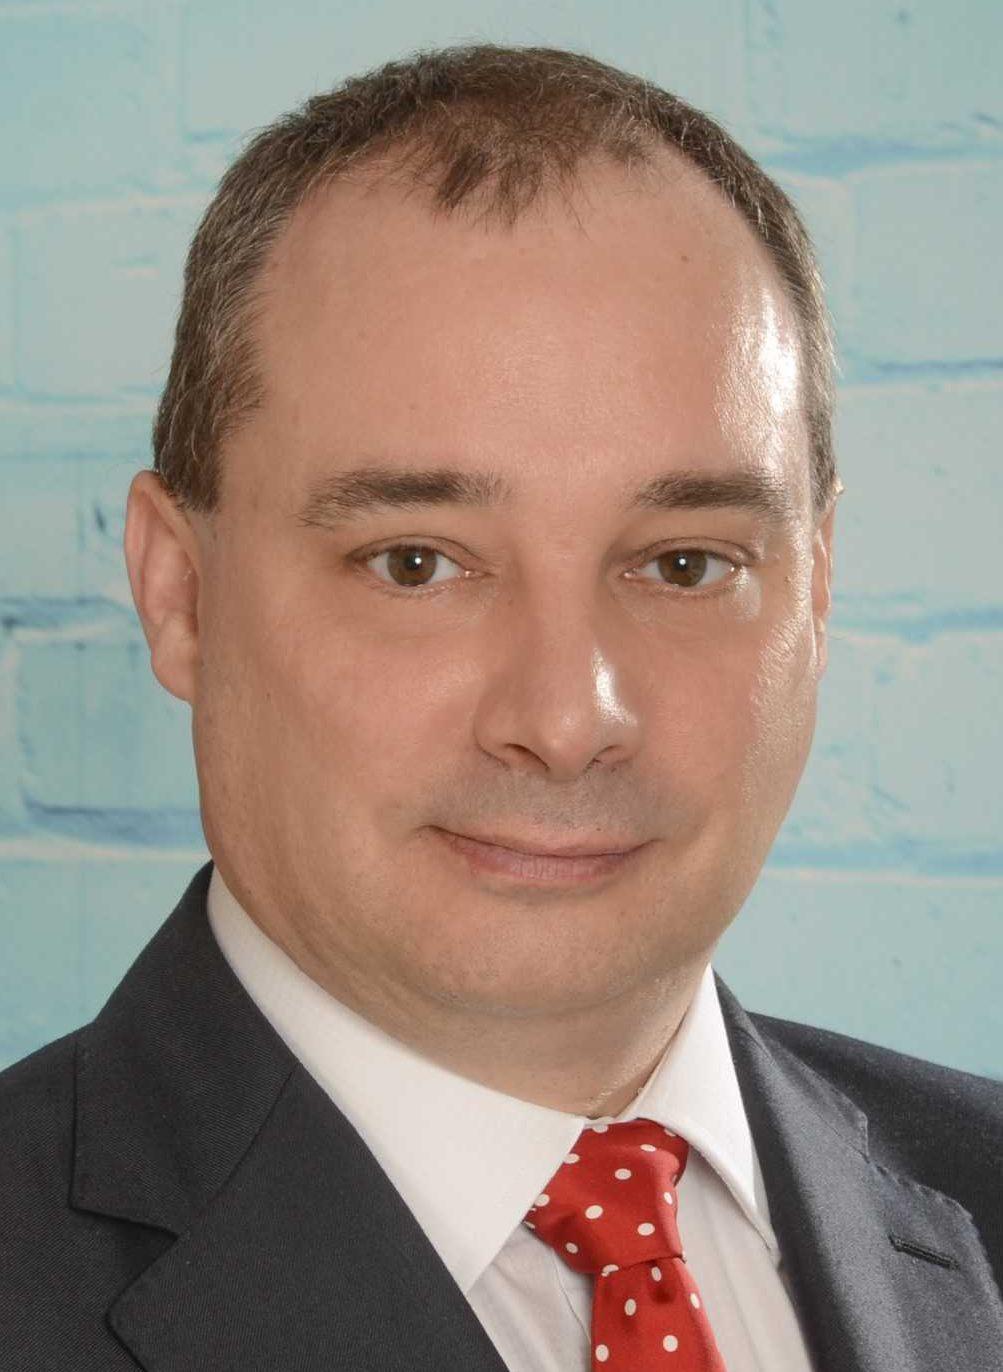 Richard Wildin on Coronavirus and supply chains